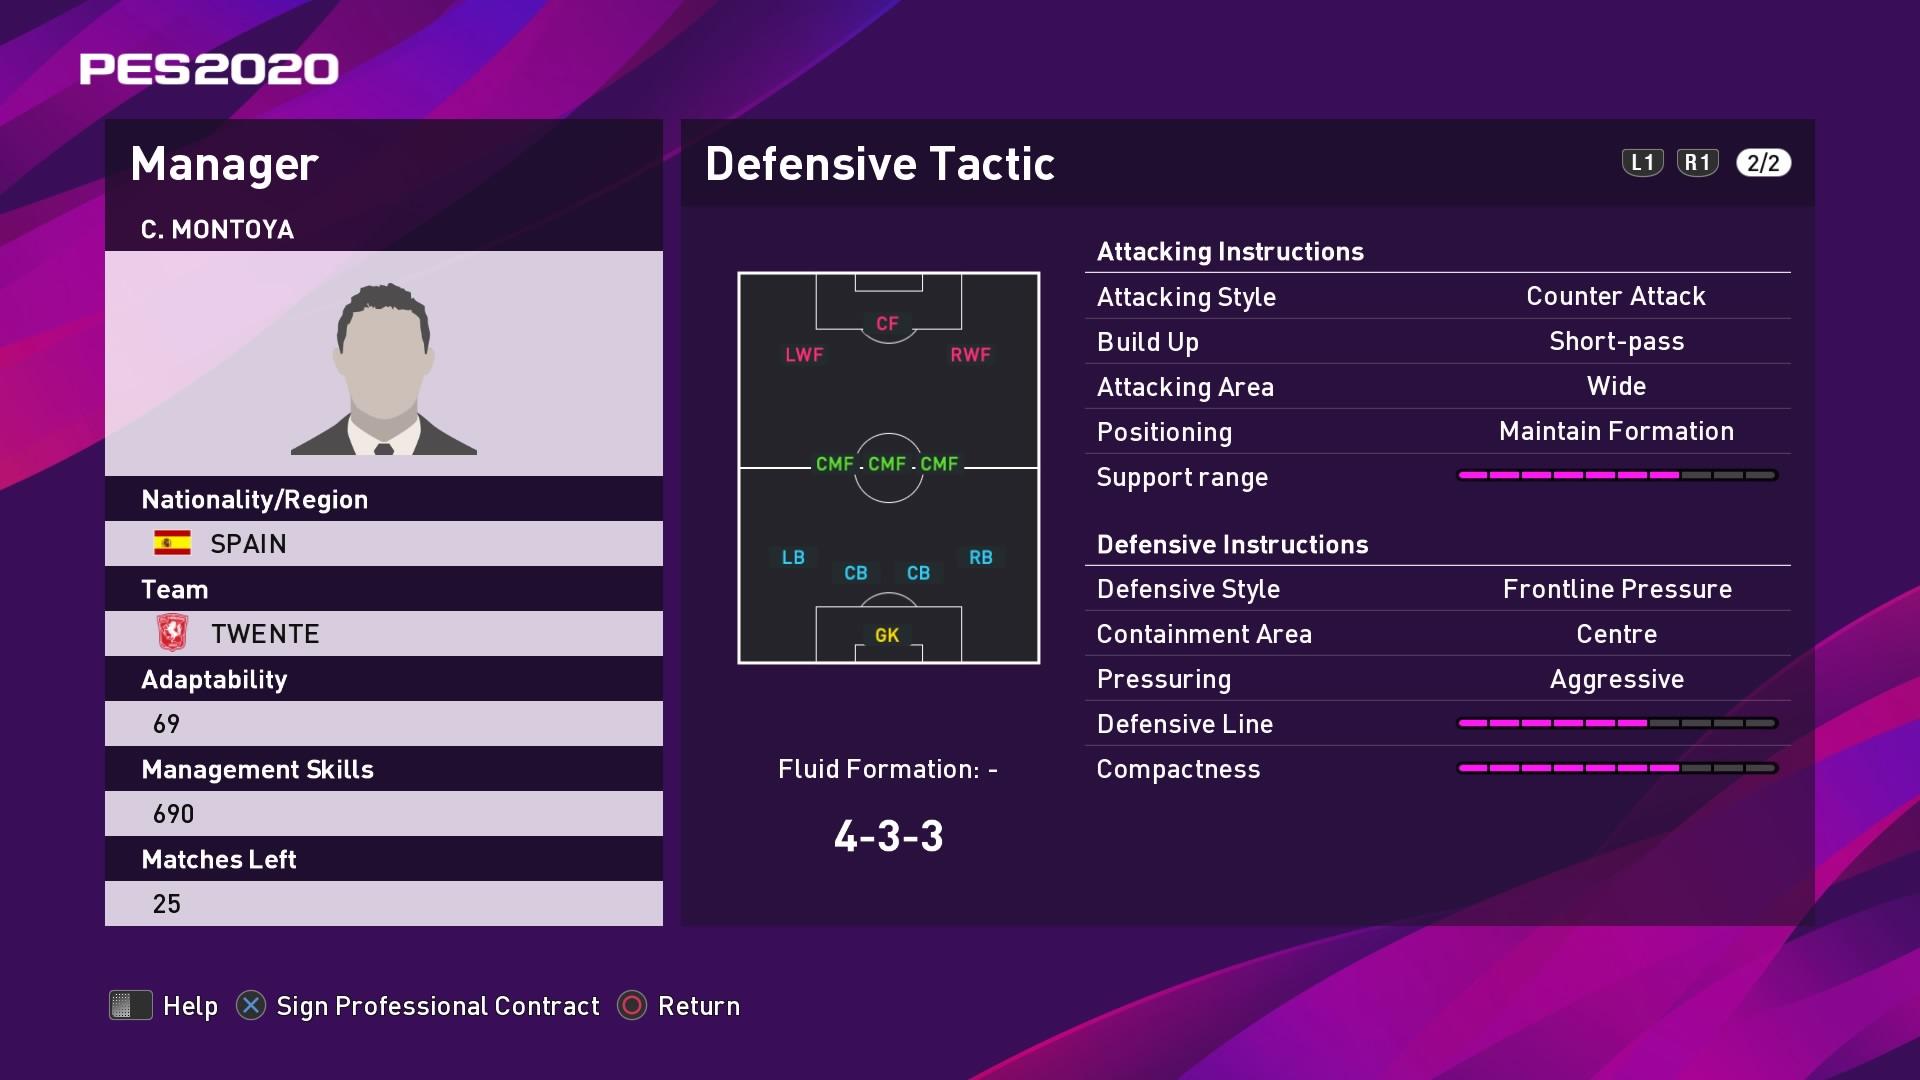 C. Montoya (Gonzalo) Defensive Tactic in PES 2020 myClub